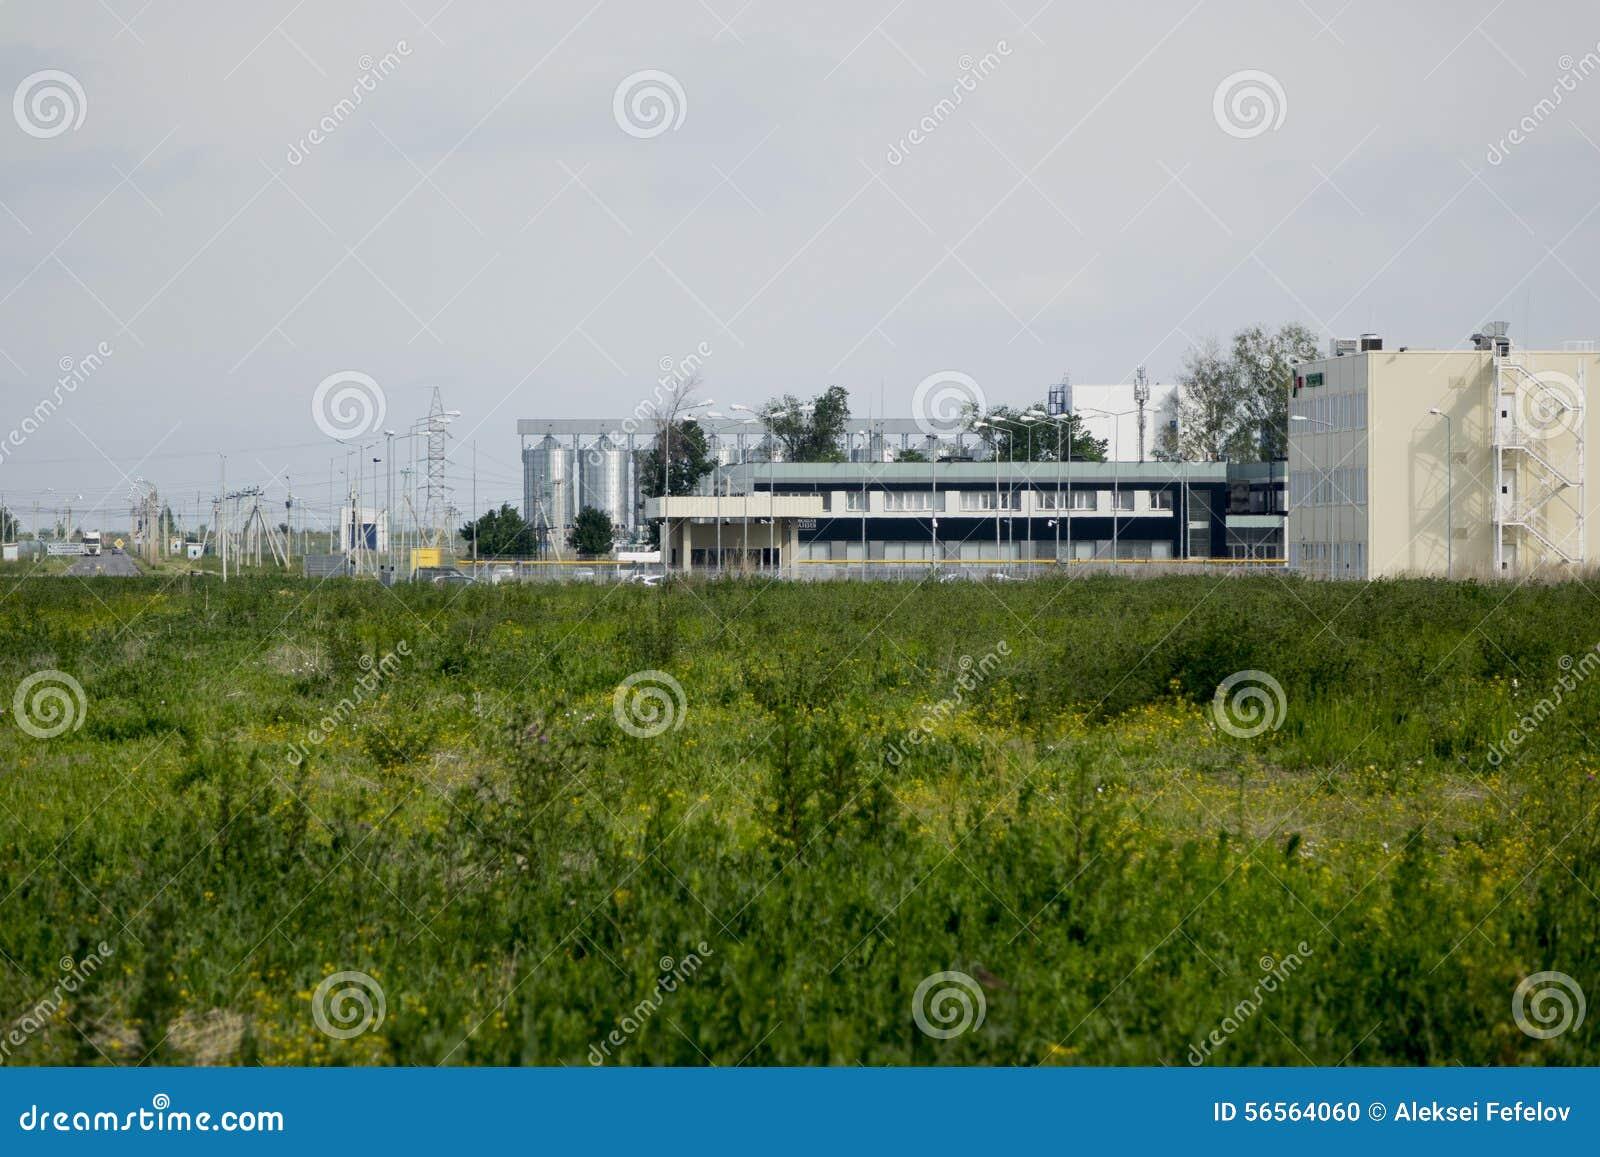 Download τα χρώματα κτηρίων αντιπαραβάλλουν υψηλό βιομηχανικό Στοκ Εικόνες - εικόνα από εξαερισμός, βιομηχανία: 56564060